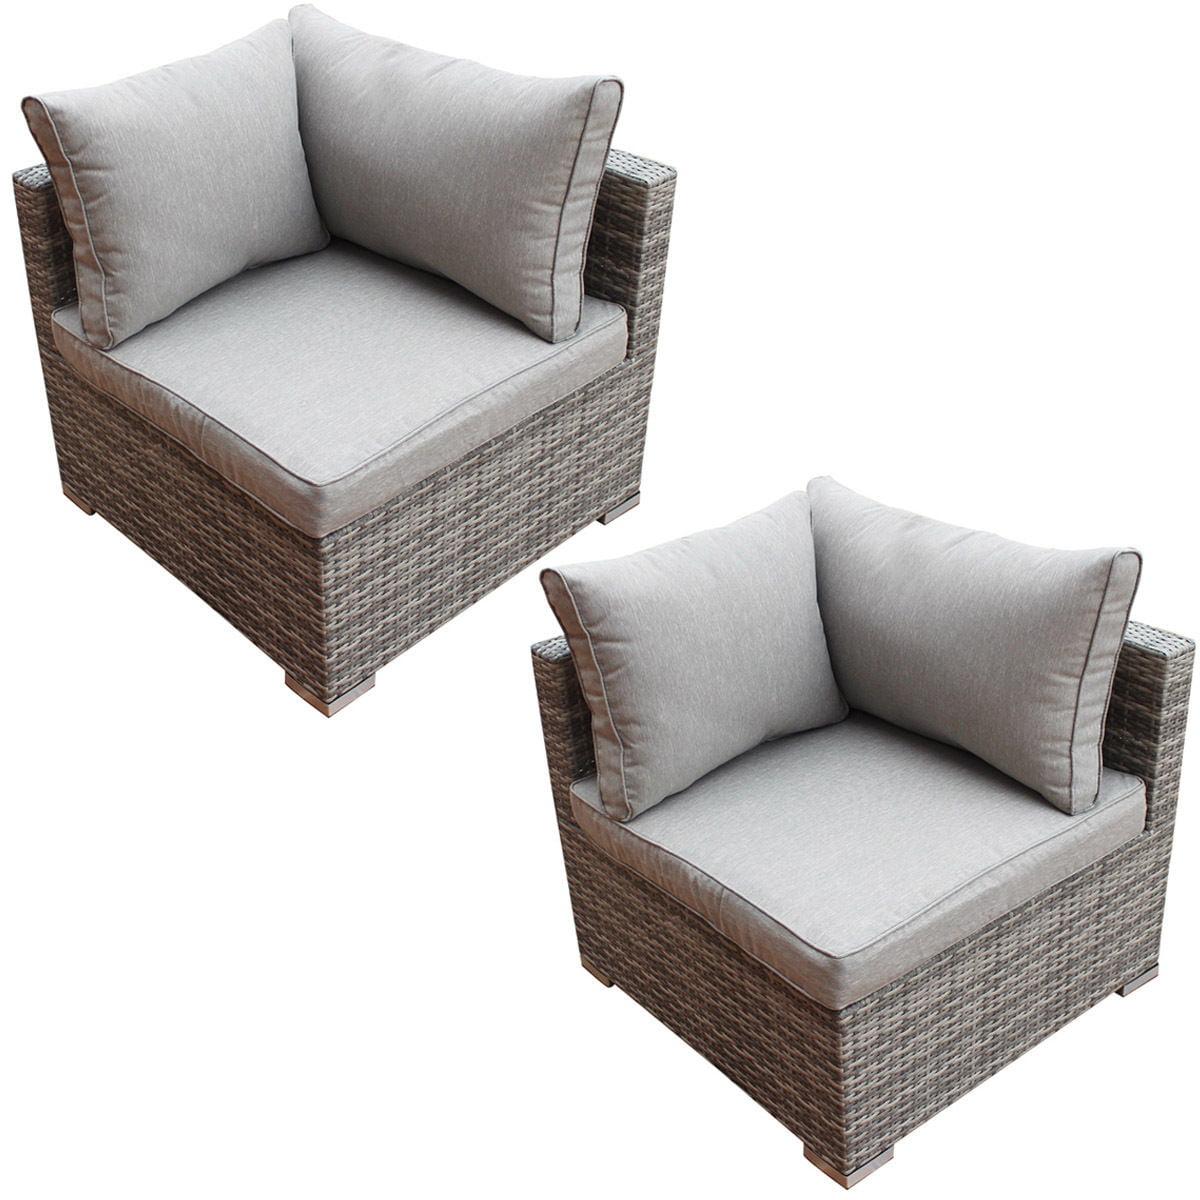 Costway Patio Rattan Sofa Furniture Set Infinitely Combination Cushioned PE Wicker